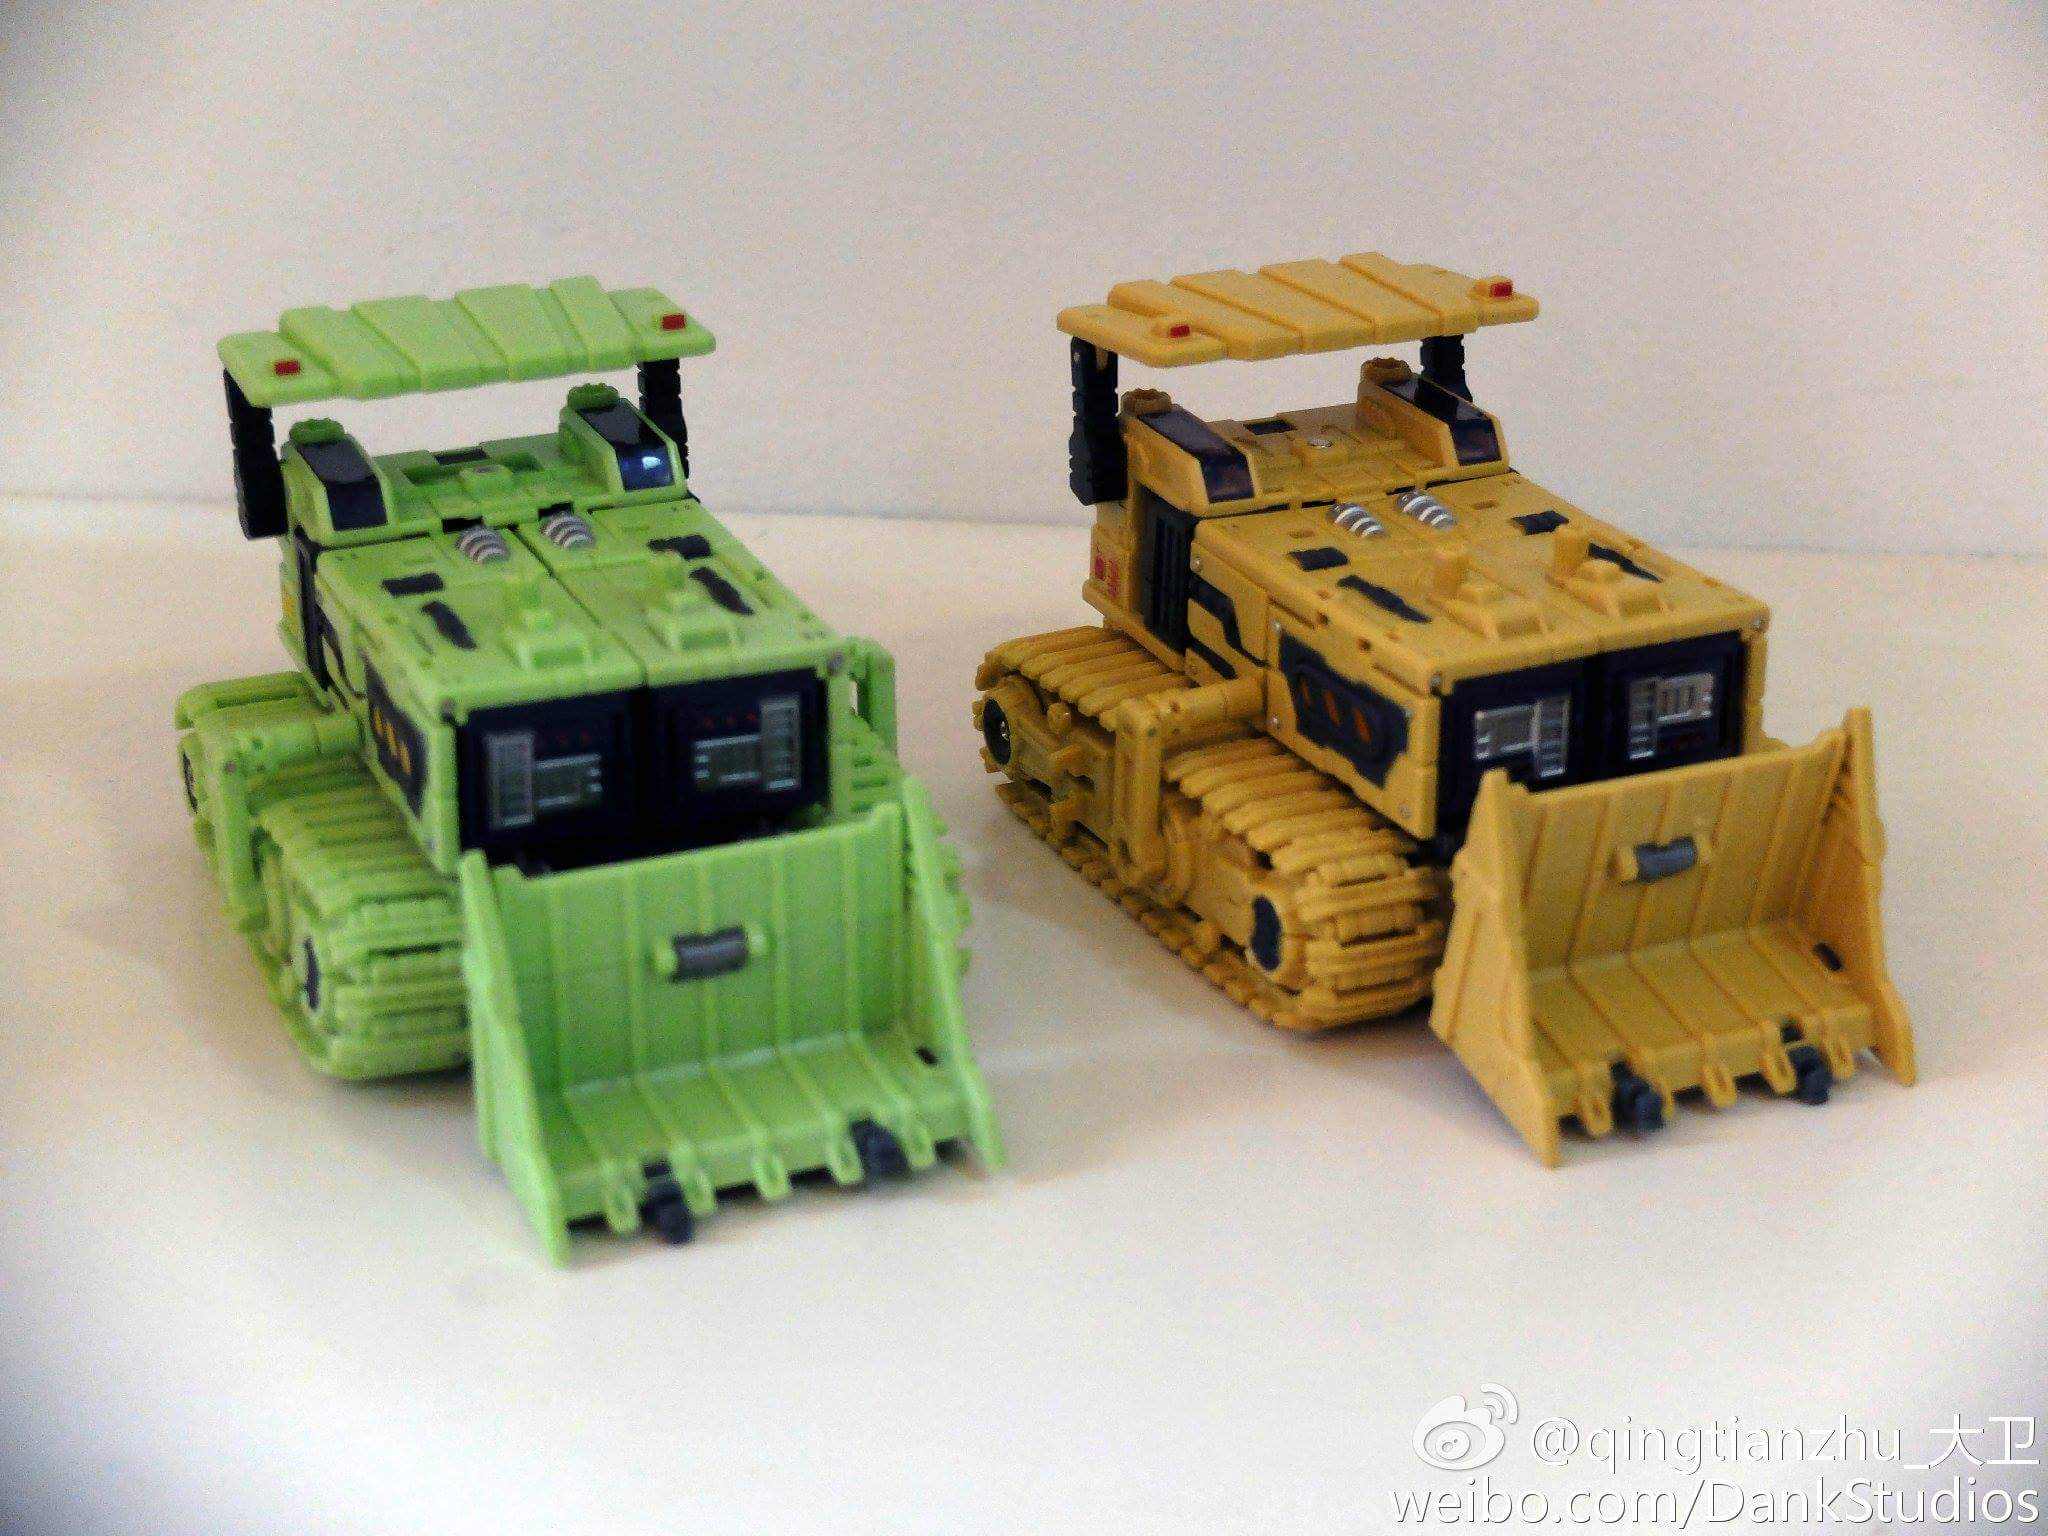 [Toyworld] Produit Tiers - Jouet TW-C Constructor aka Devastator/Dévastateur (Version vert G1 et jaune G2) - Page 8 R8lwWJfD